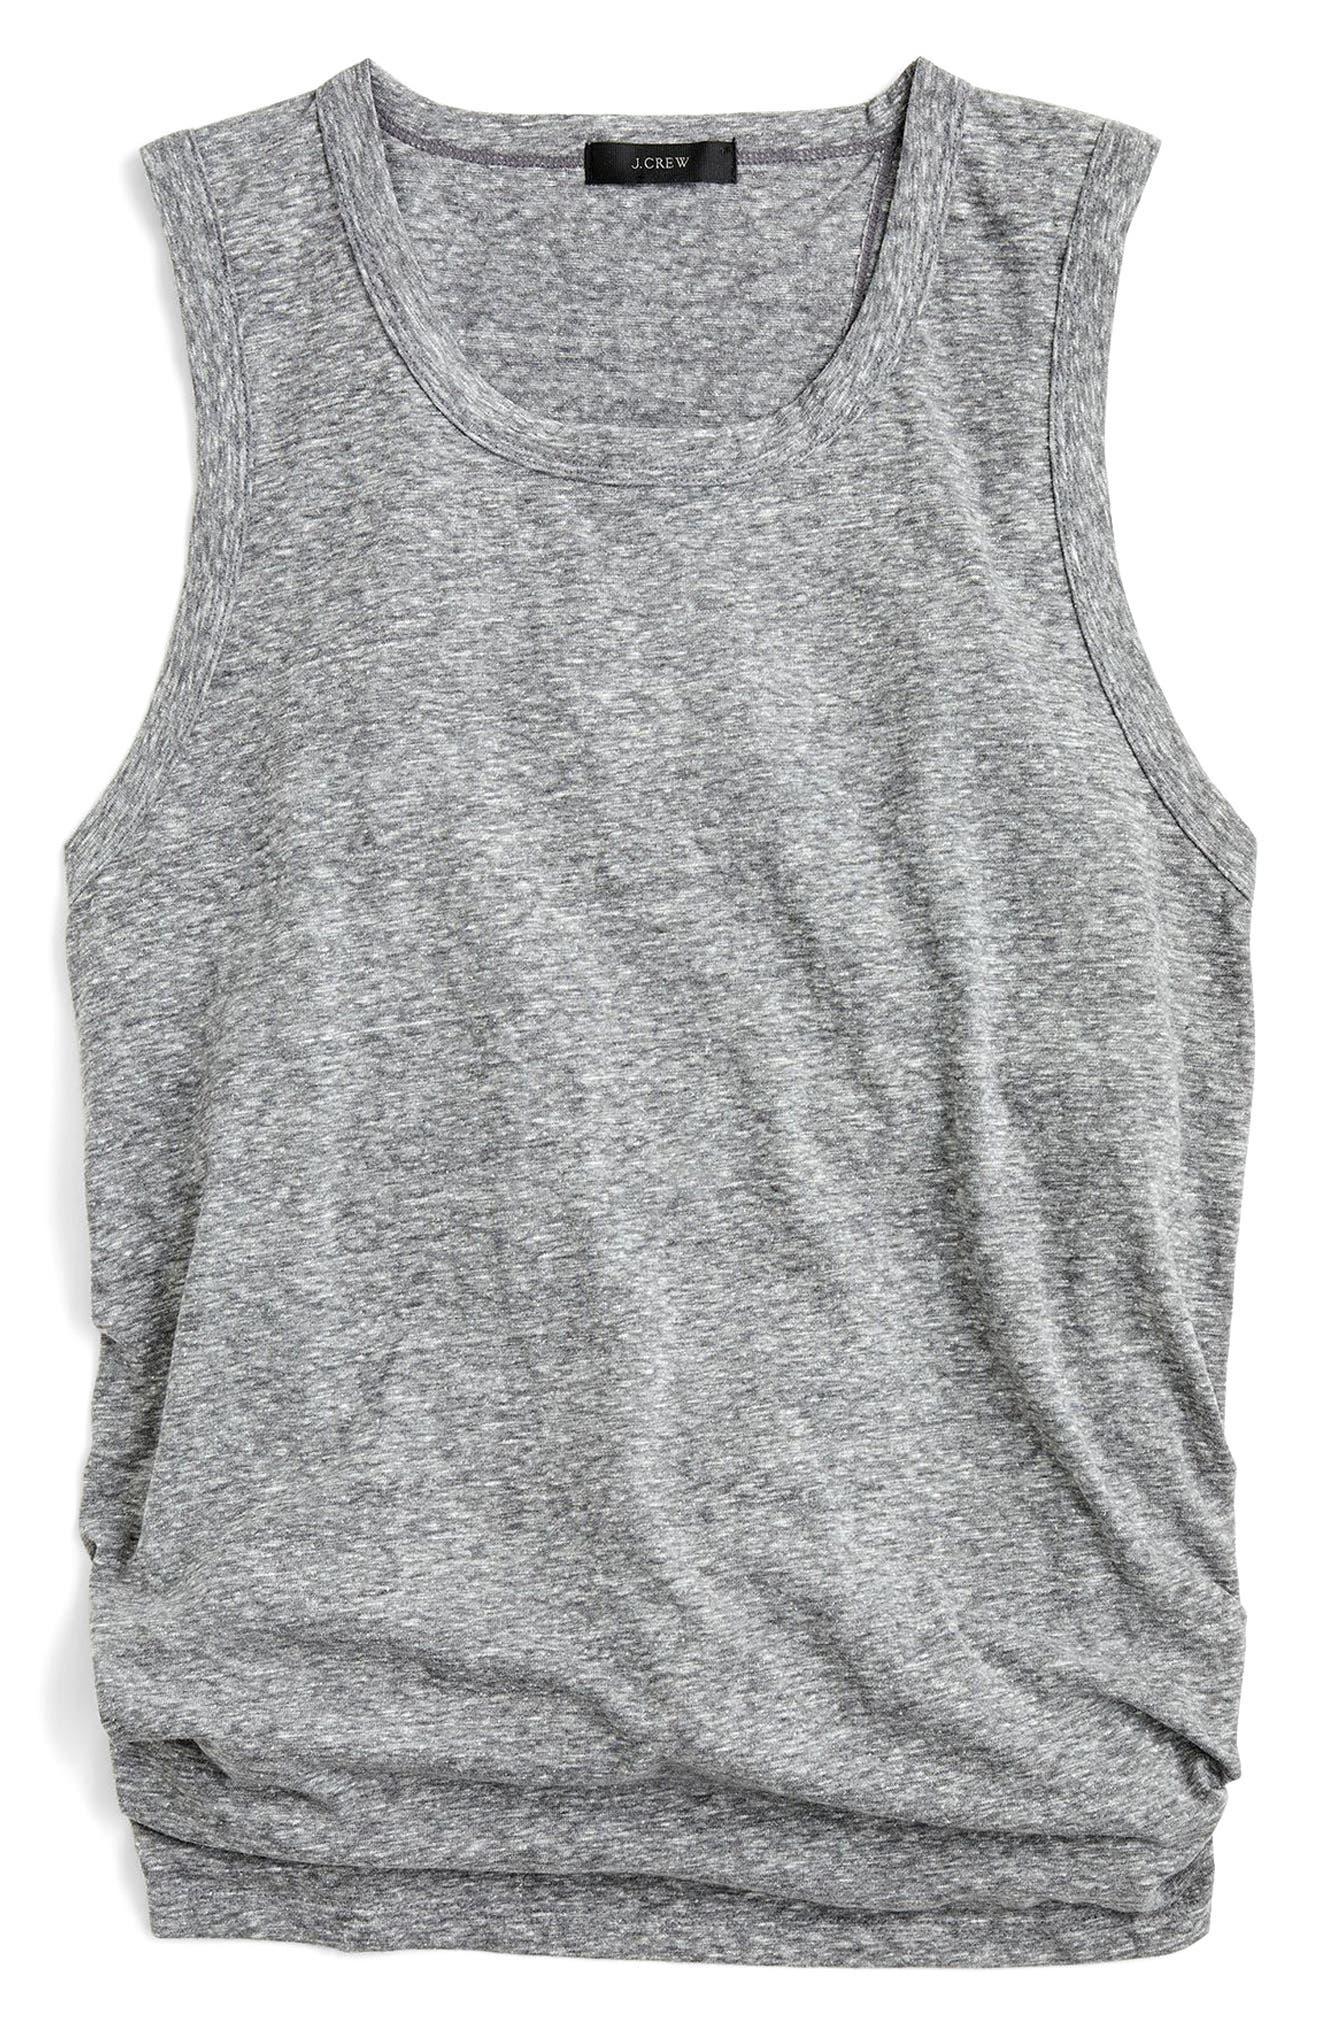 J.CREW Tie-Back Tank Top, Main, color, 021